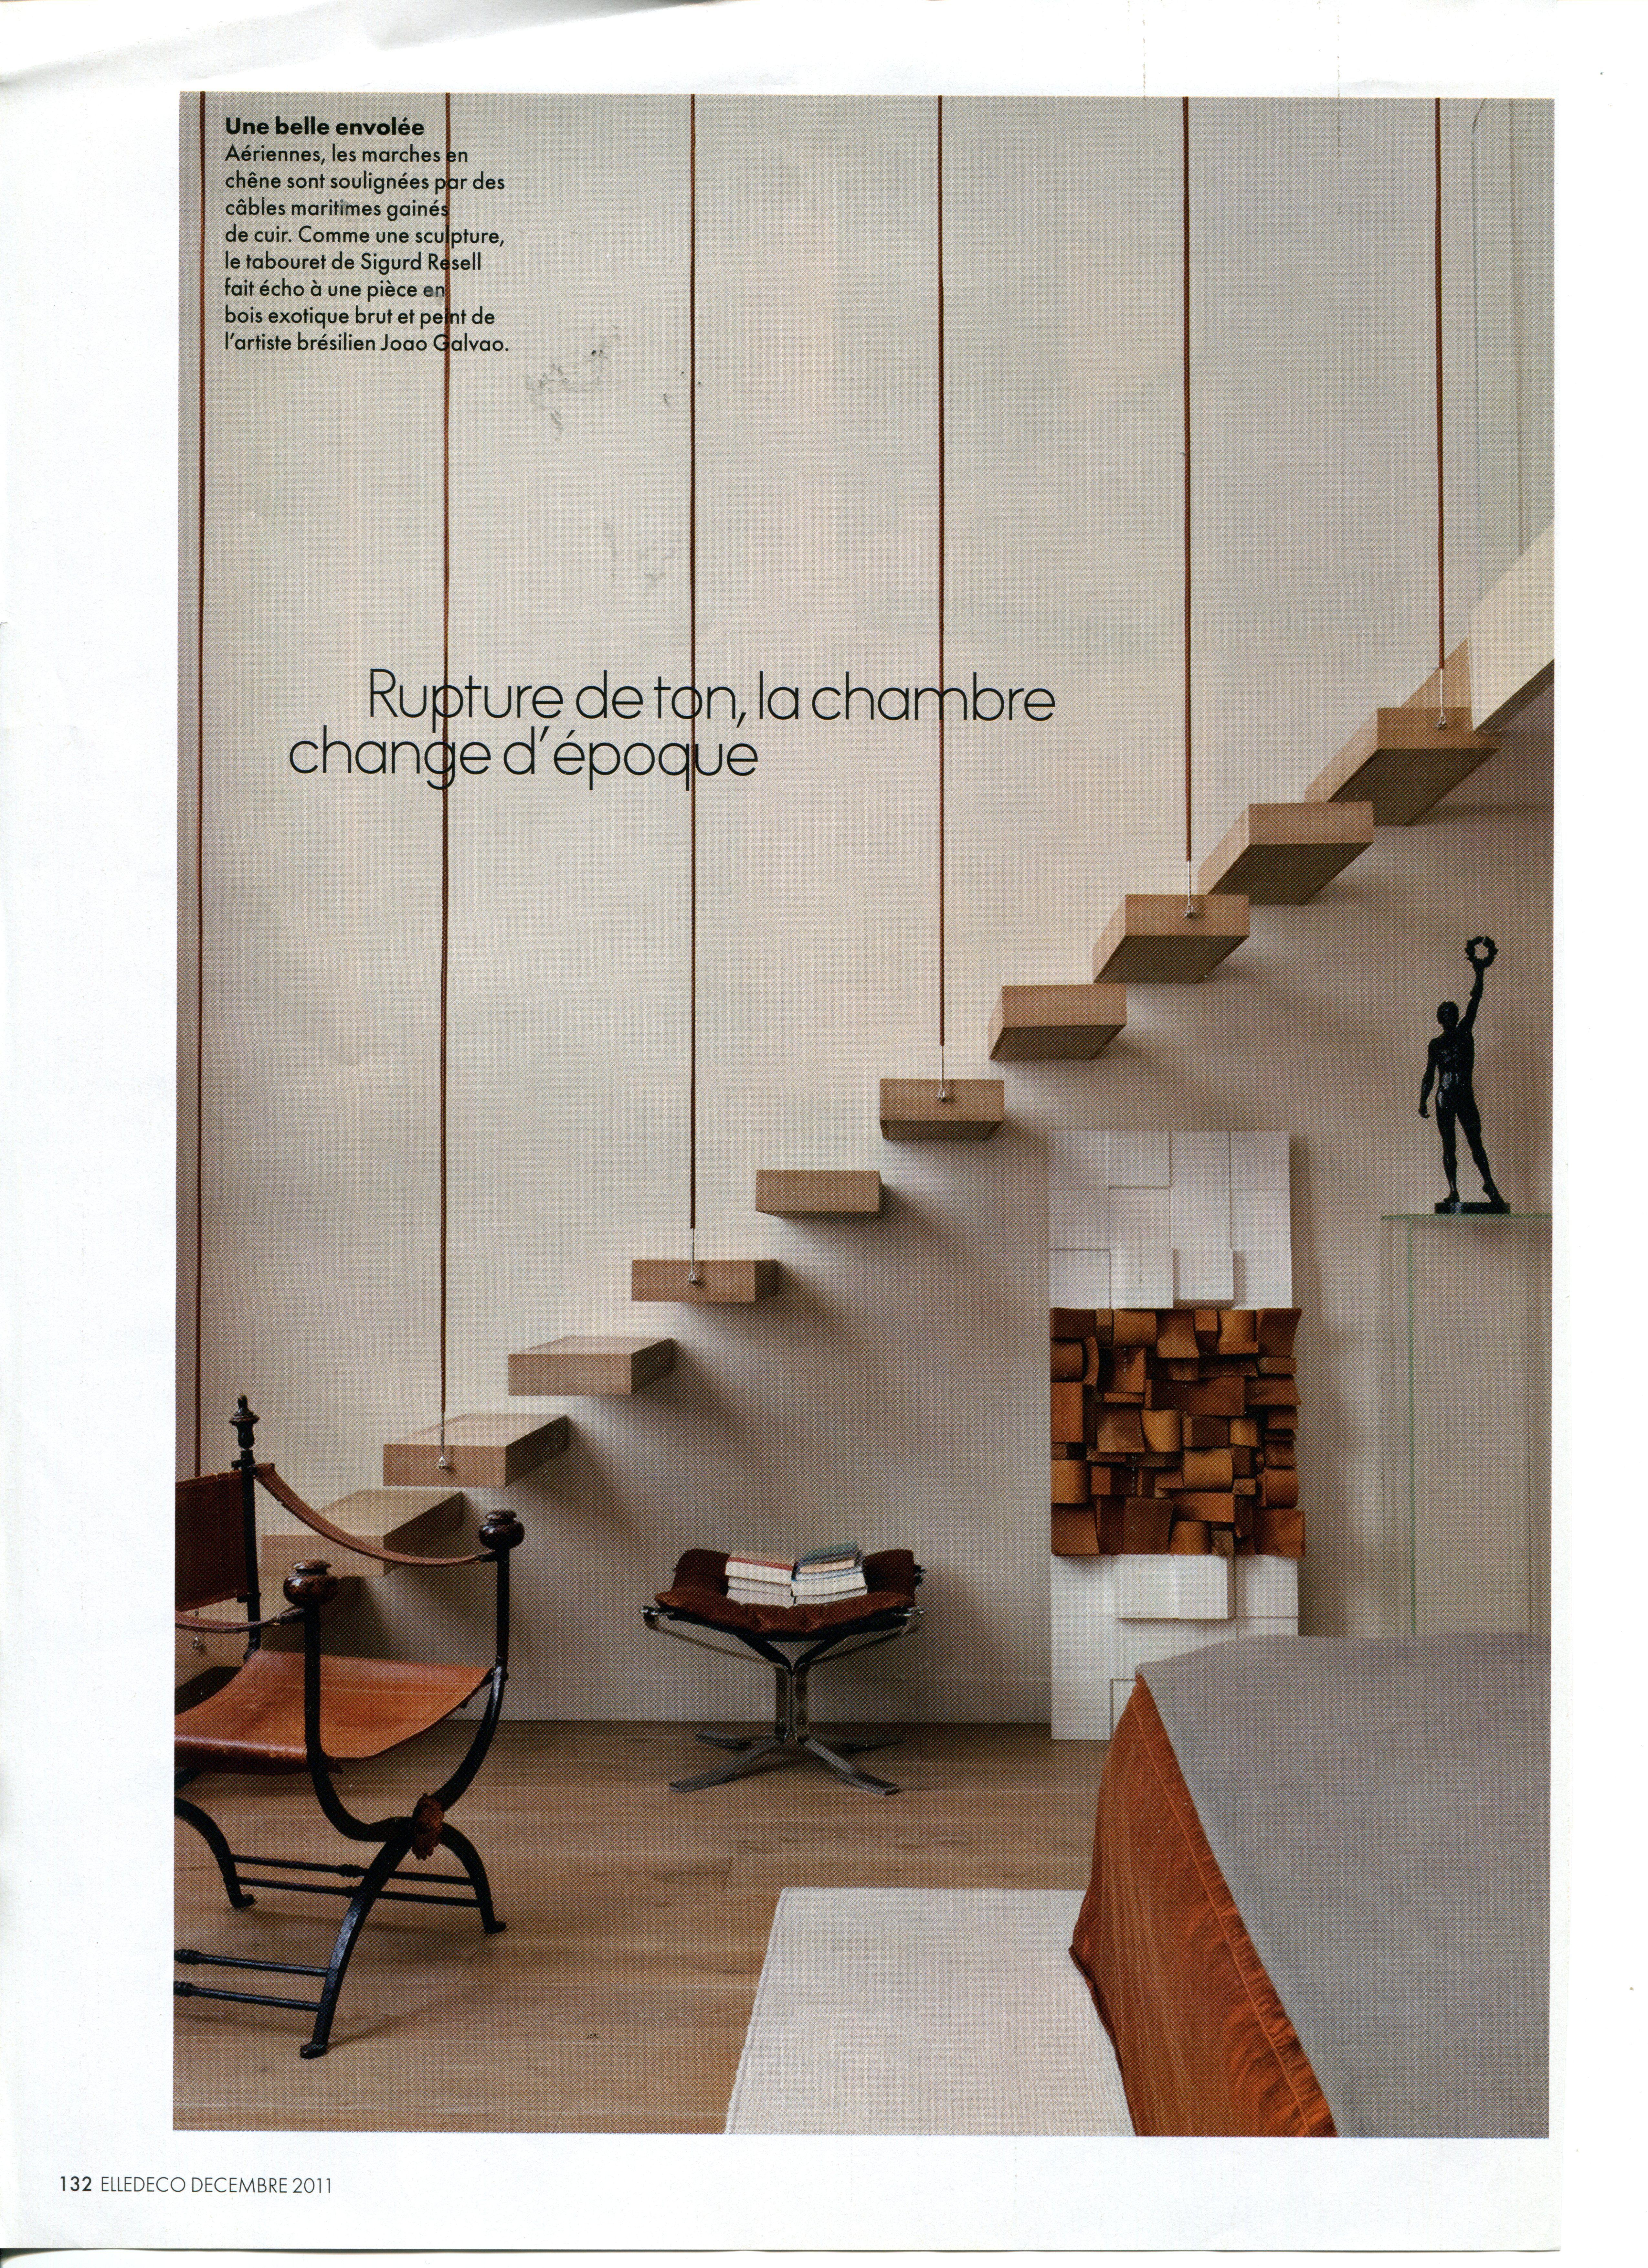 escalier bois rambarde corde decoraci n pinterest. Black Bedroom Furniture Sets. Home Design Ideas